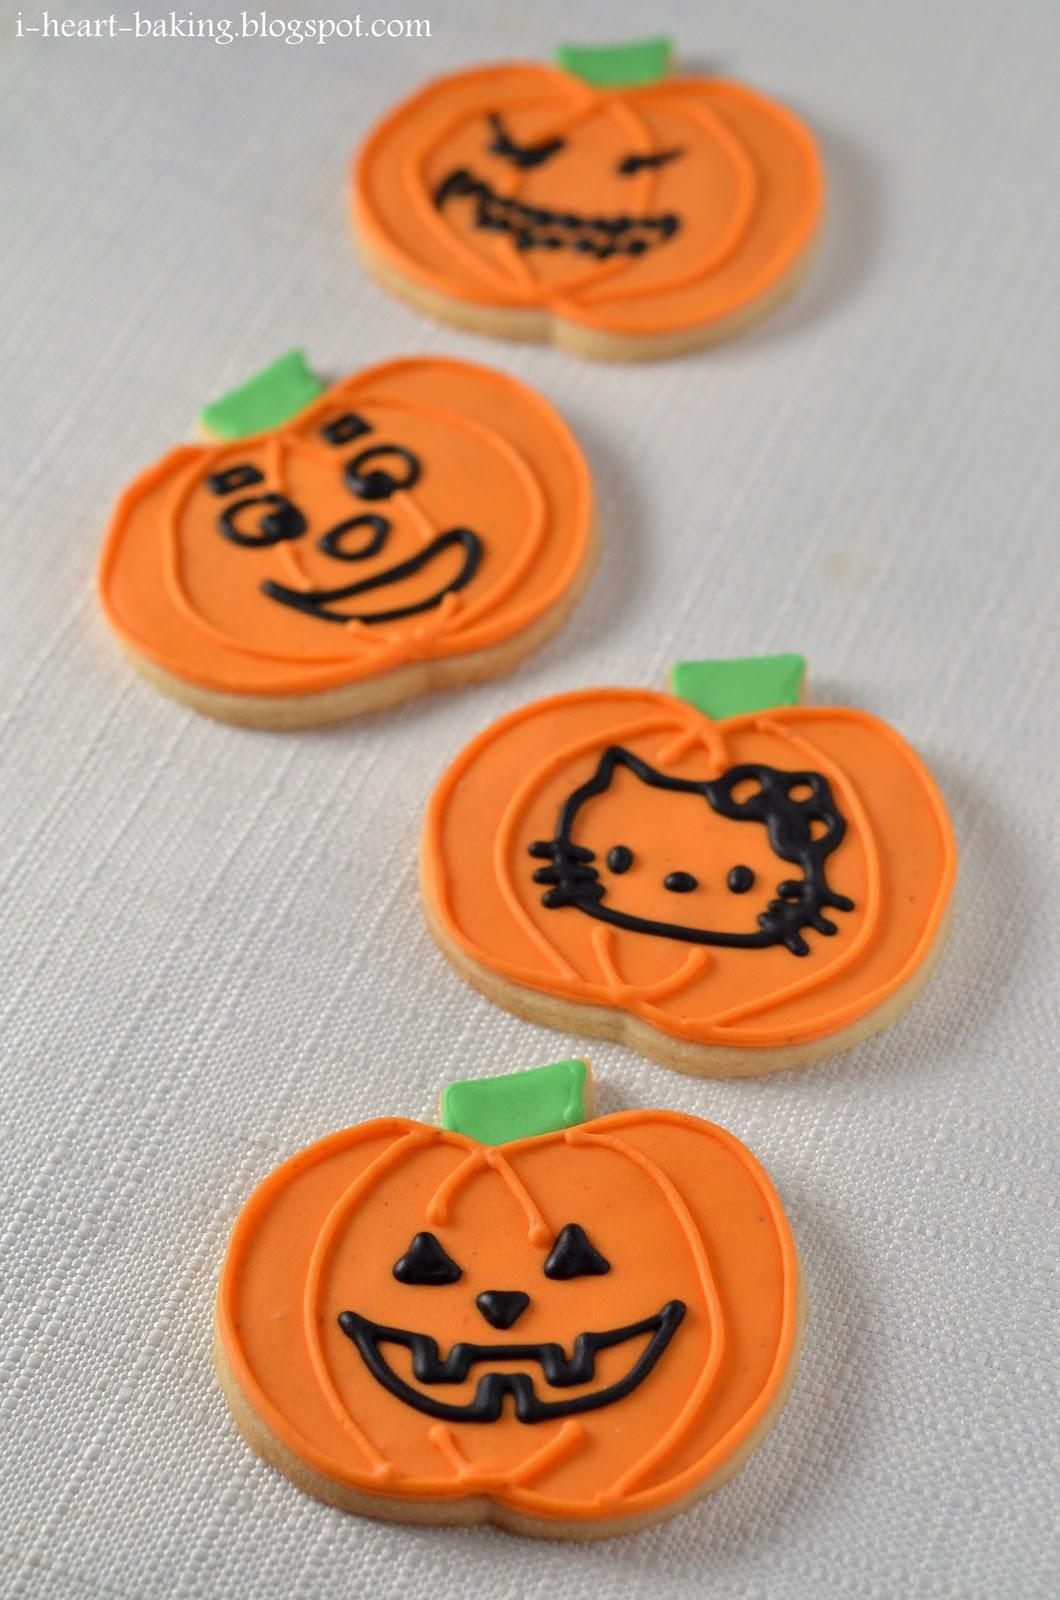 ... baking!: halloween cookies - jack-o-lantern pumpkin spice cookies